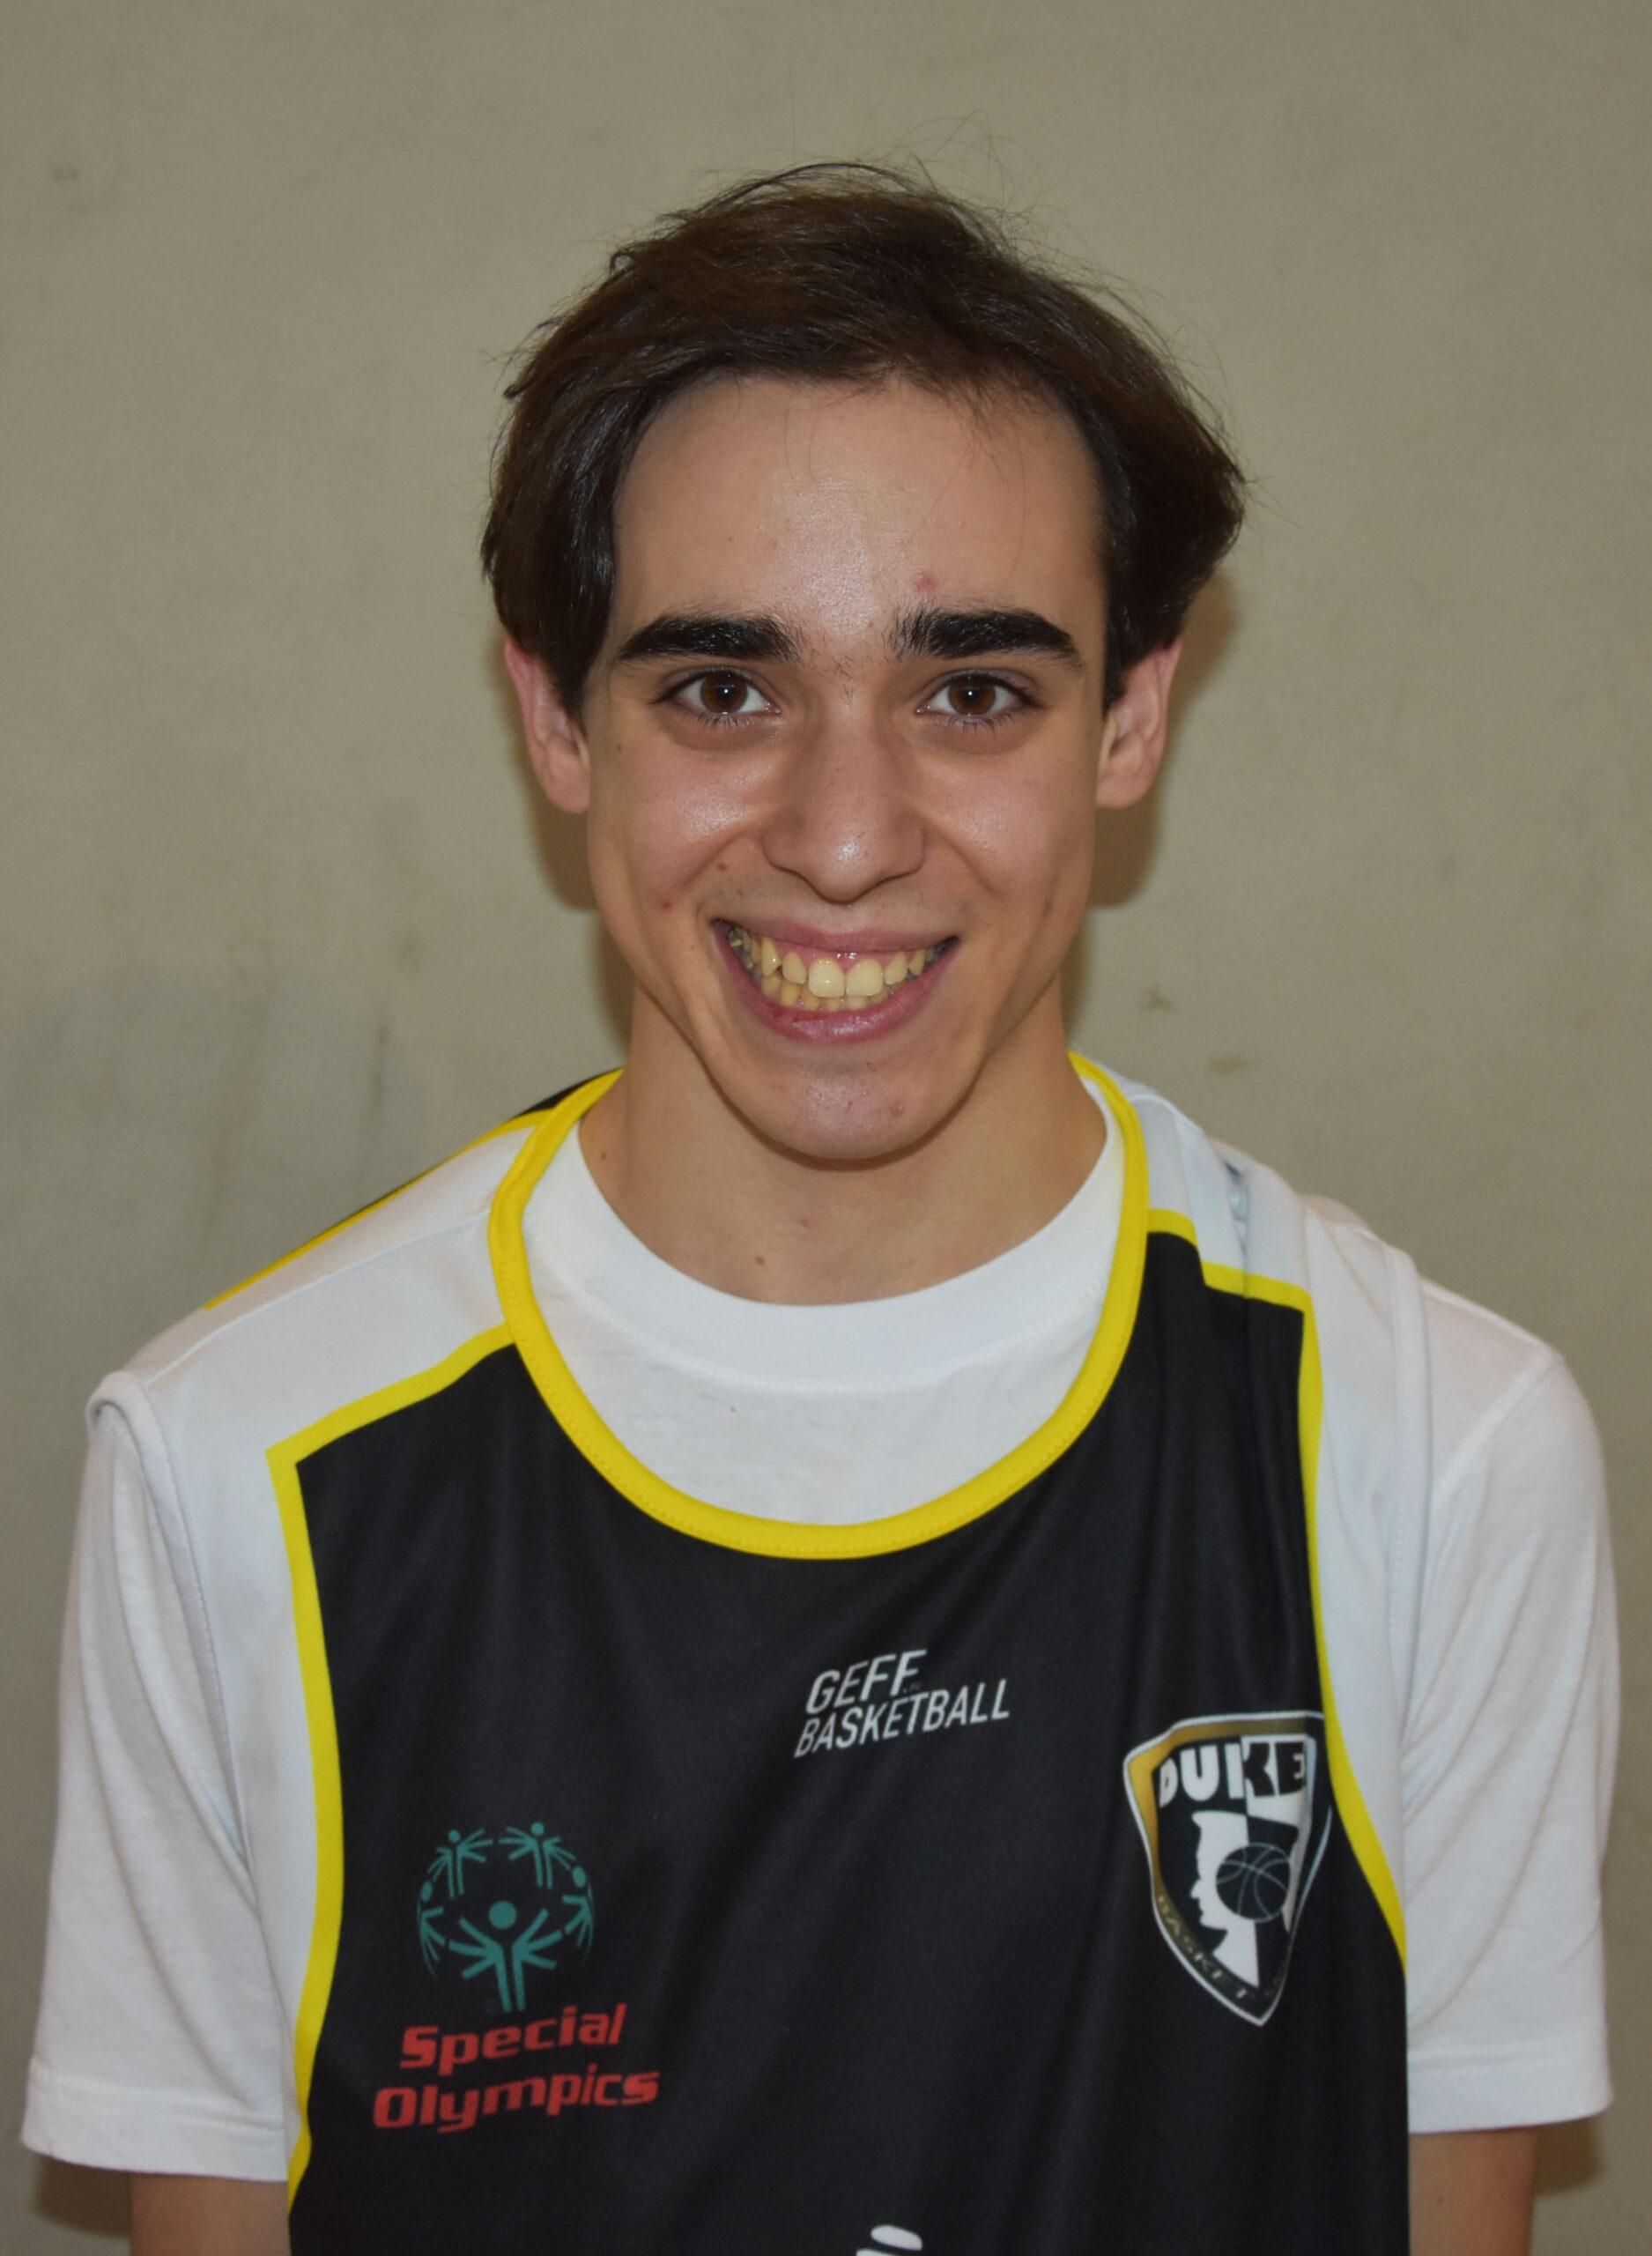 Marco Marrani